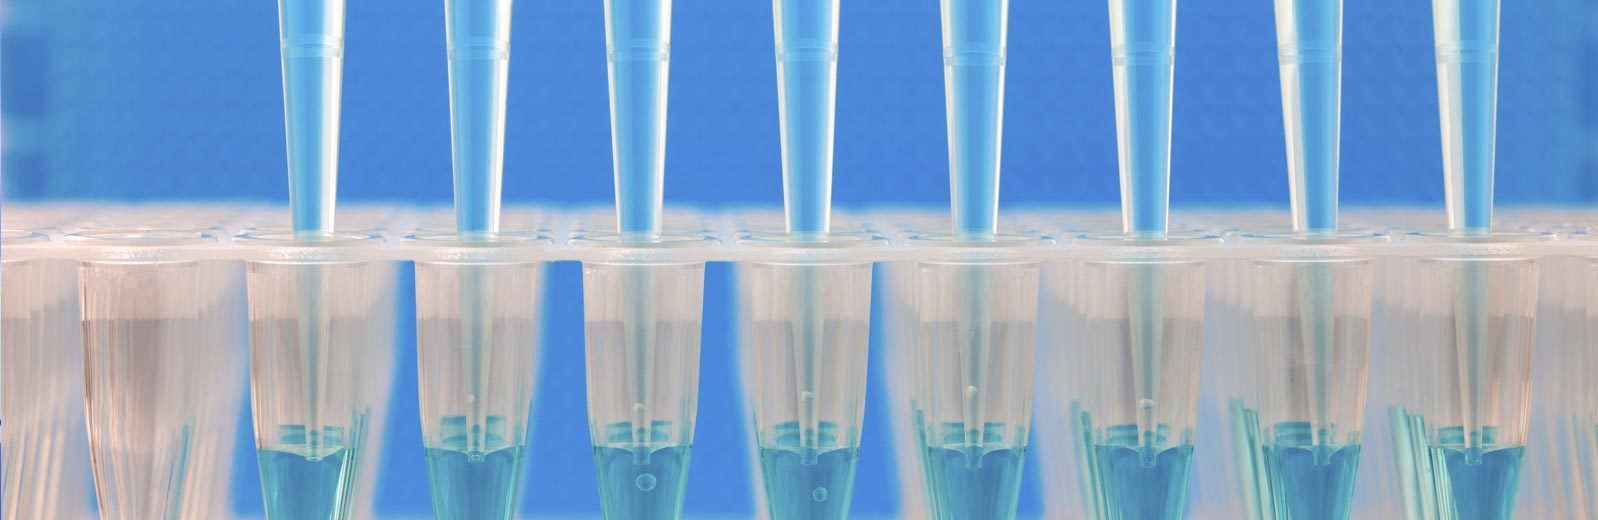 banner-blue-liquid.jpg